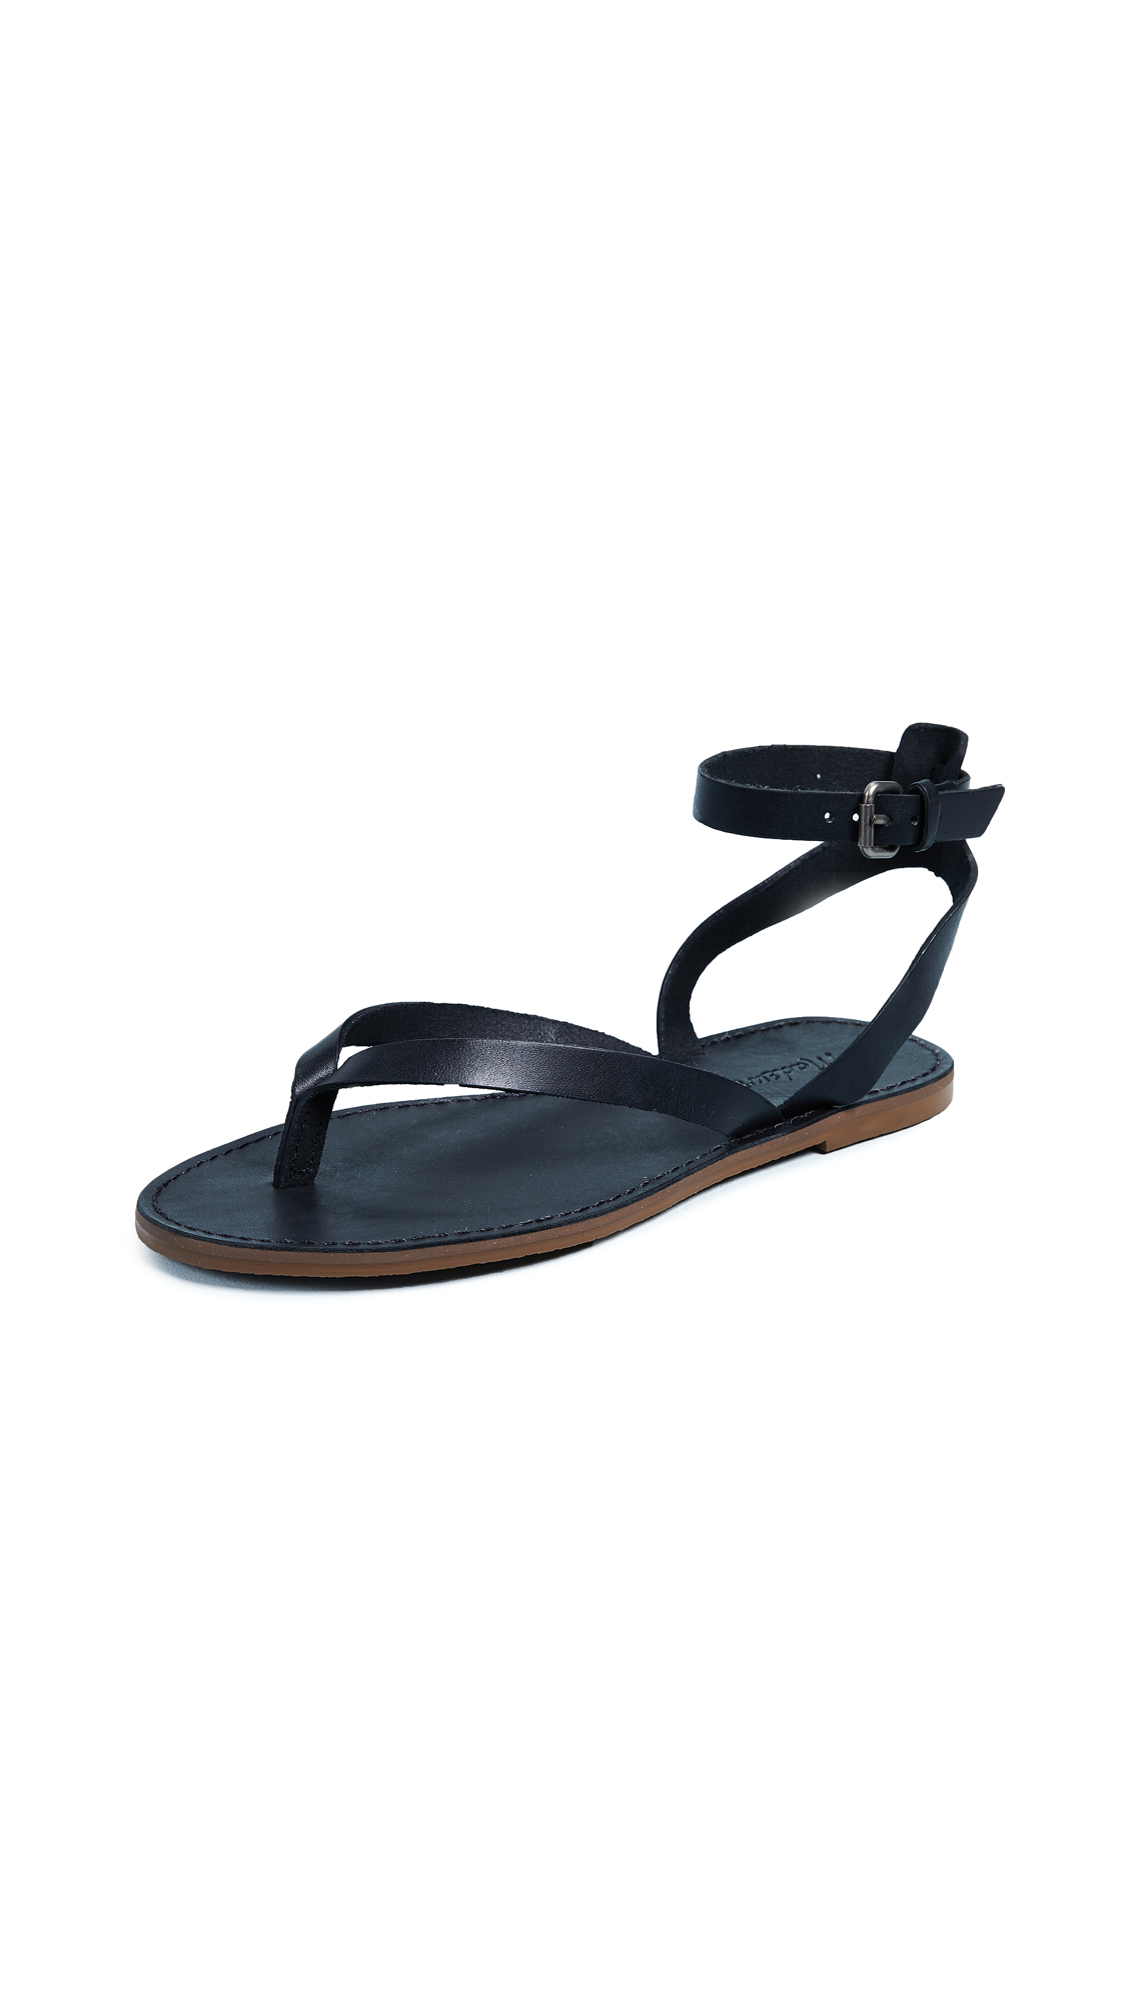 Madewell The Boardwalk Thong Sandals